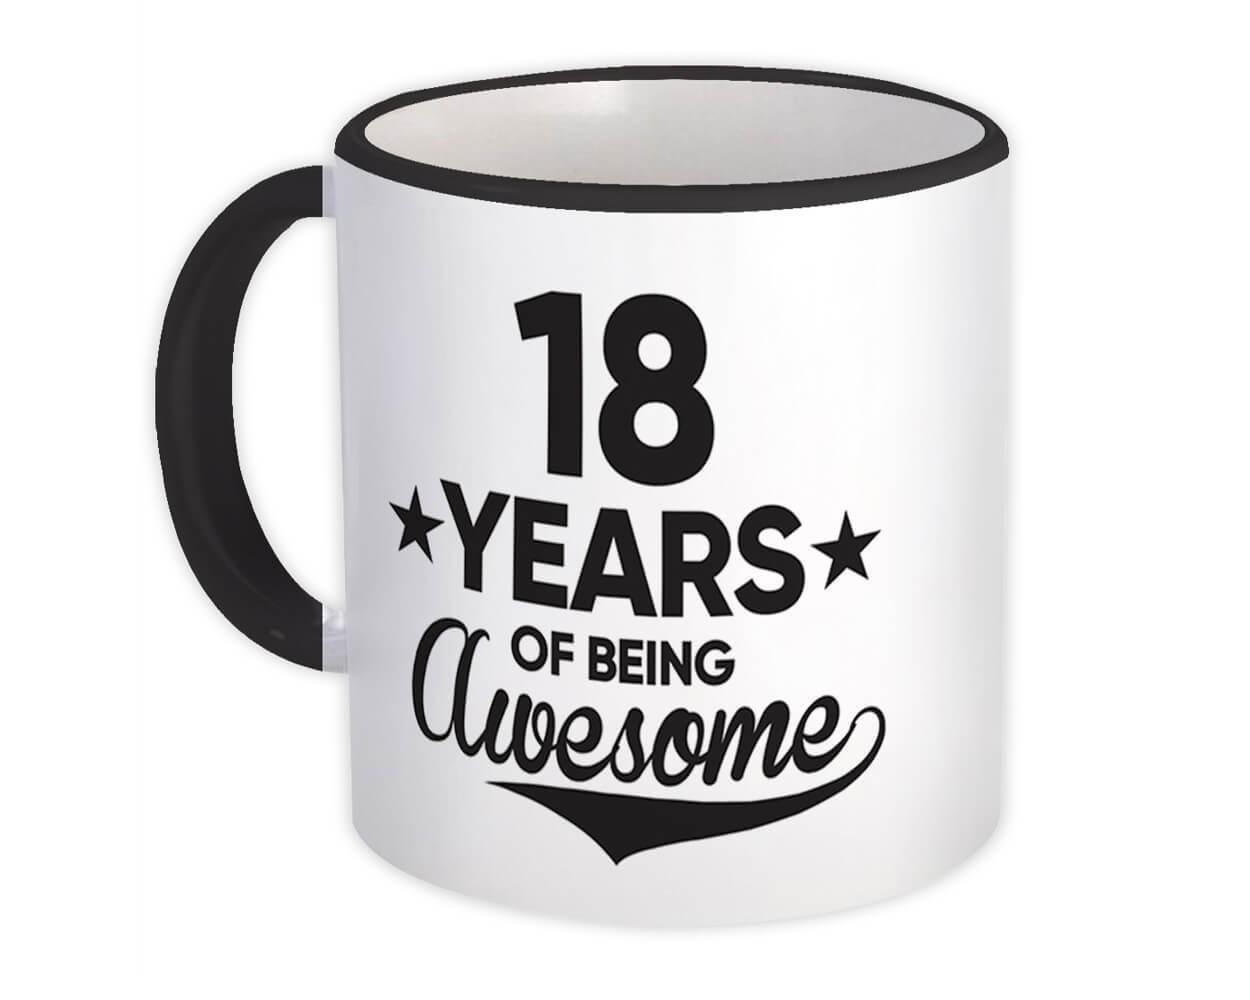 18 Years of Being Awesome : Gift Mug 18th Birthday Baseball Script Happy Cute